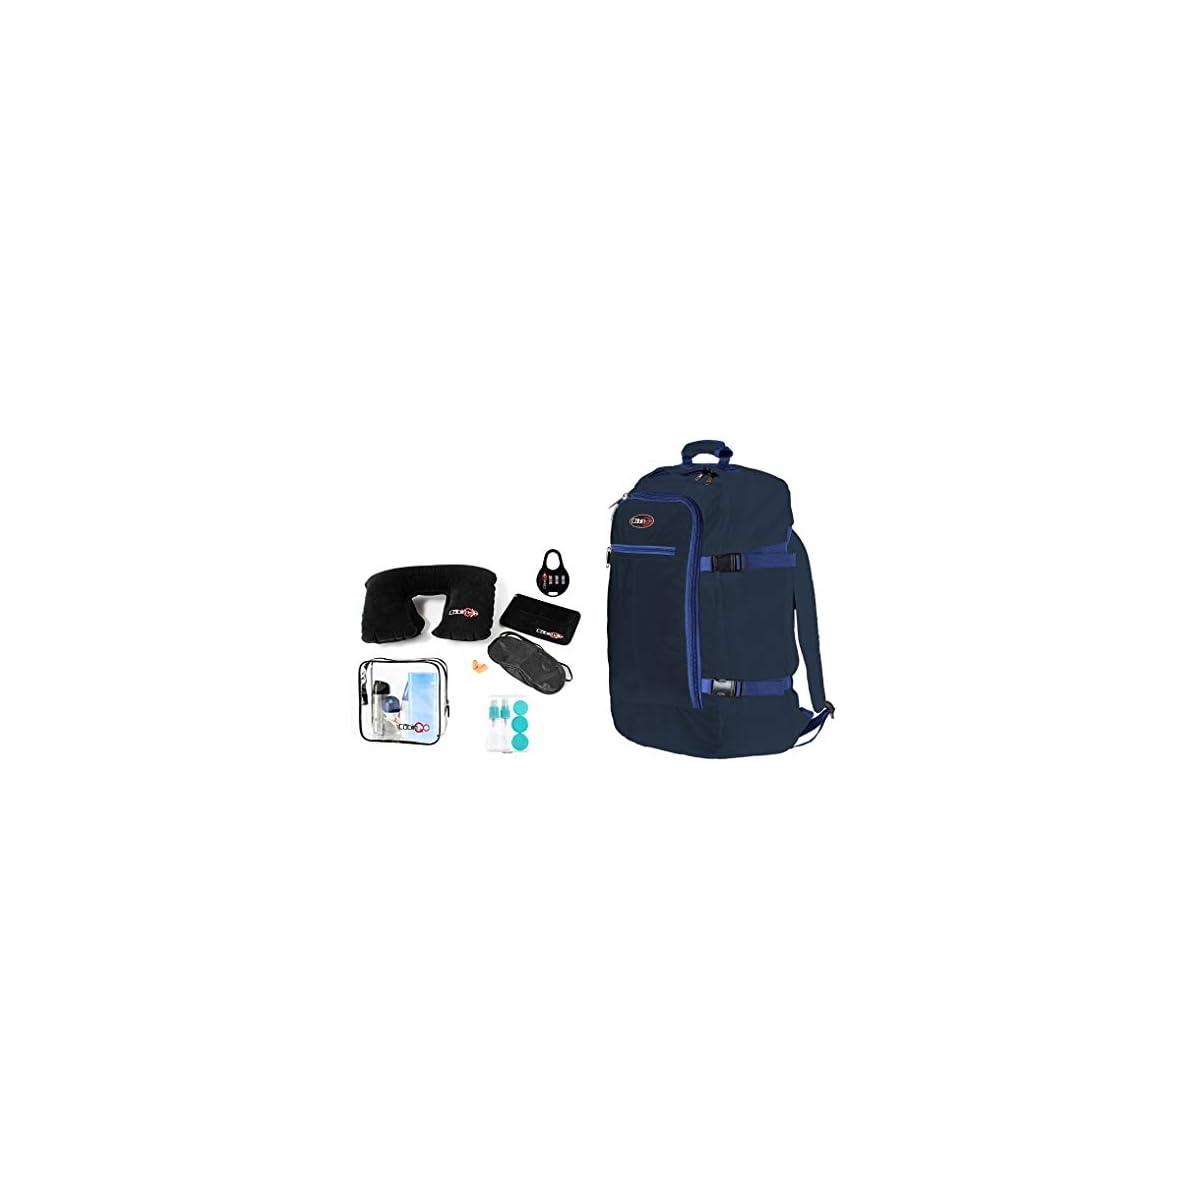 41OI1 vdveL. SS1200  - CABIN GO Mochila cod. MAX 5540 equipaje de mano/cabina de viaje, 55 x 40 x 20 cm, 44 litros de vuelo IATA aprobados/EasyJet/Ryanair